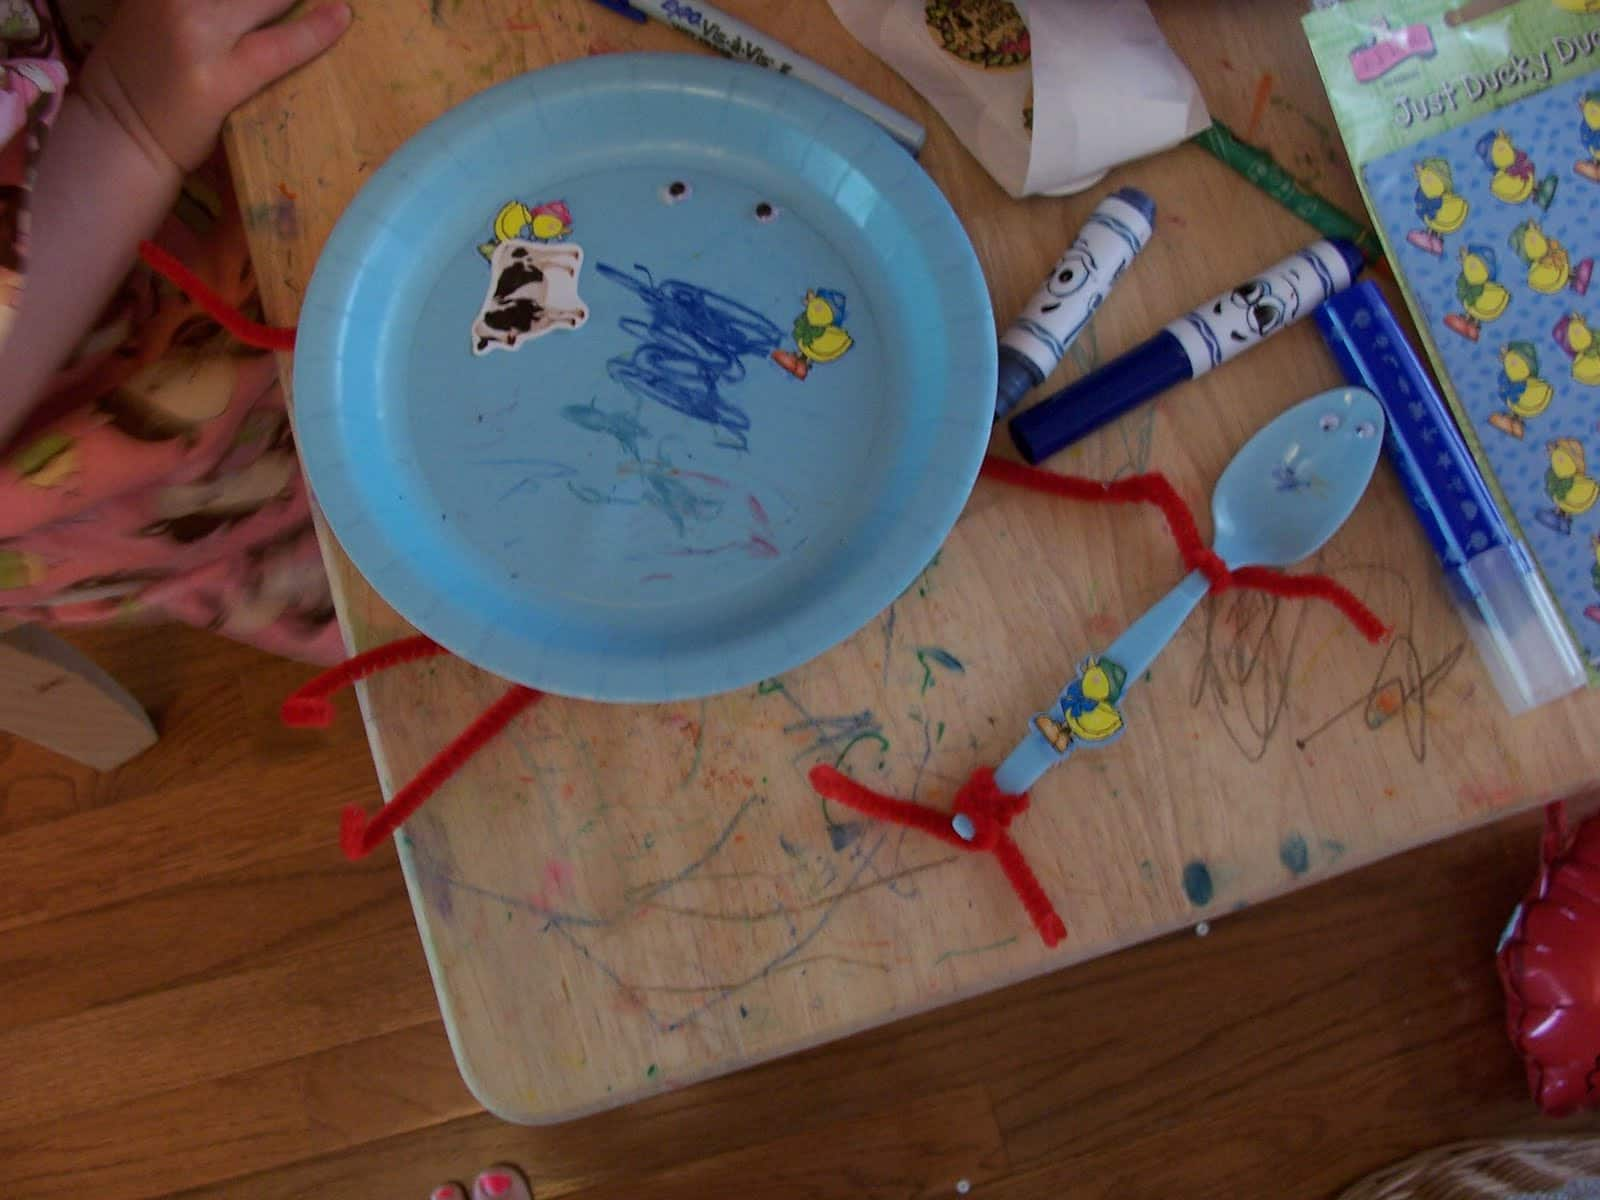 Nursery Rhyme crafts